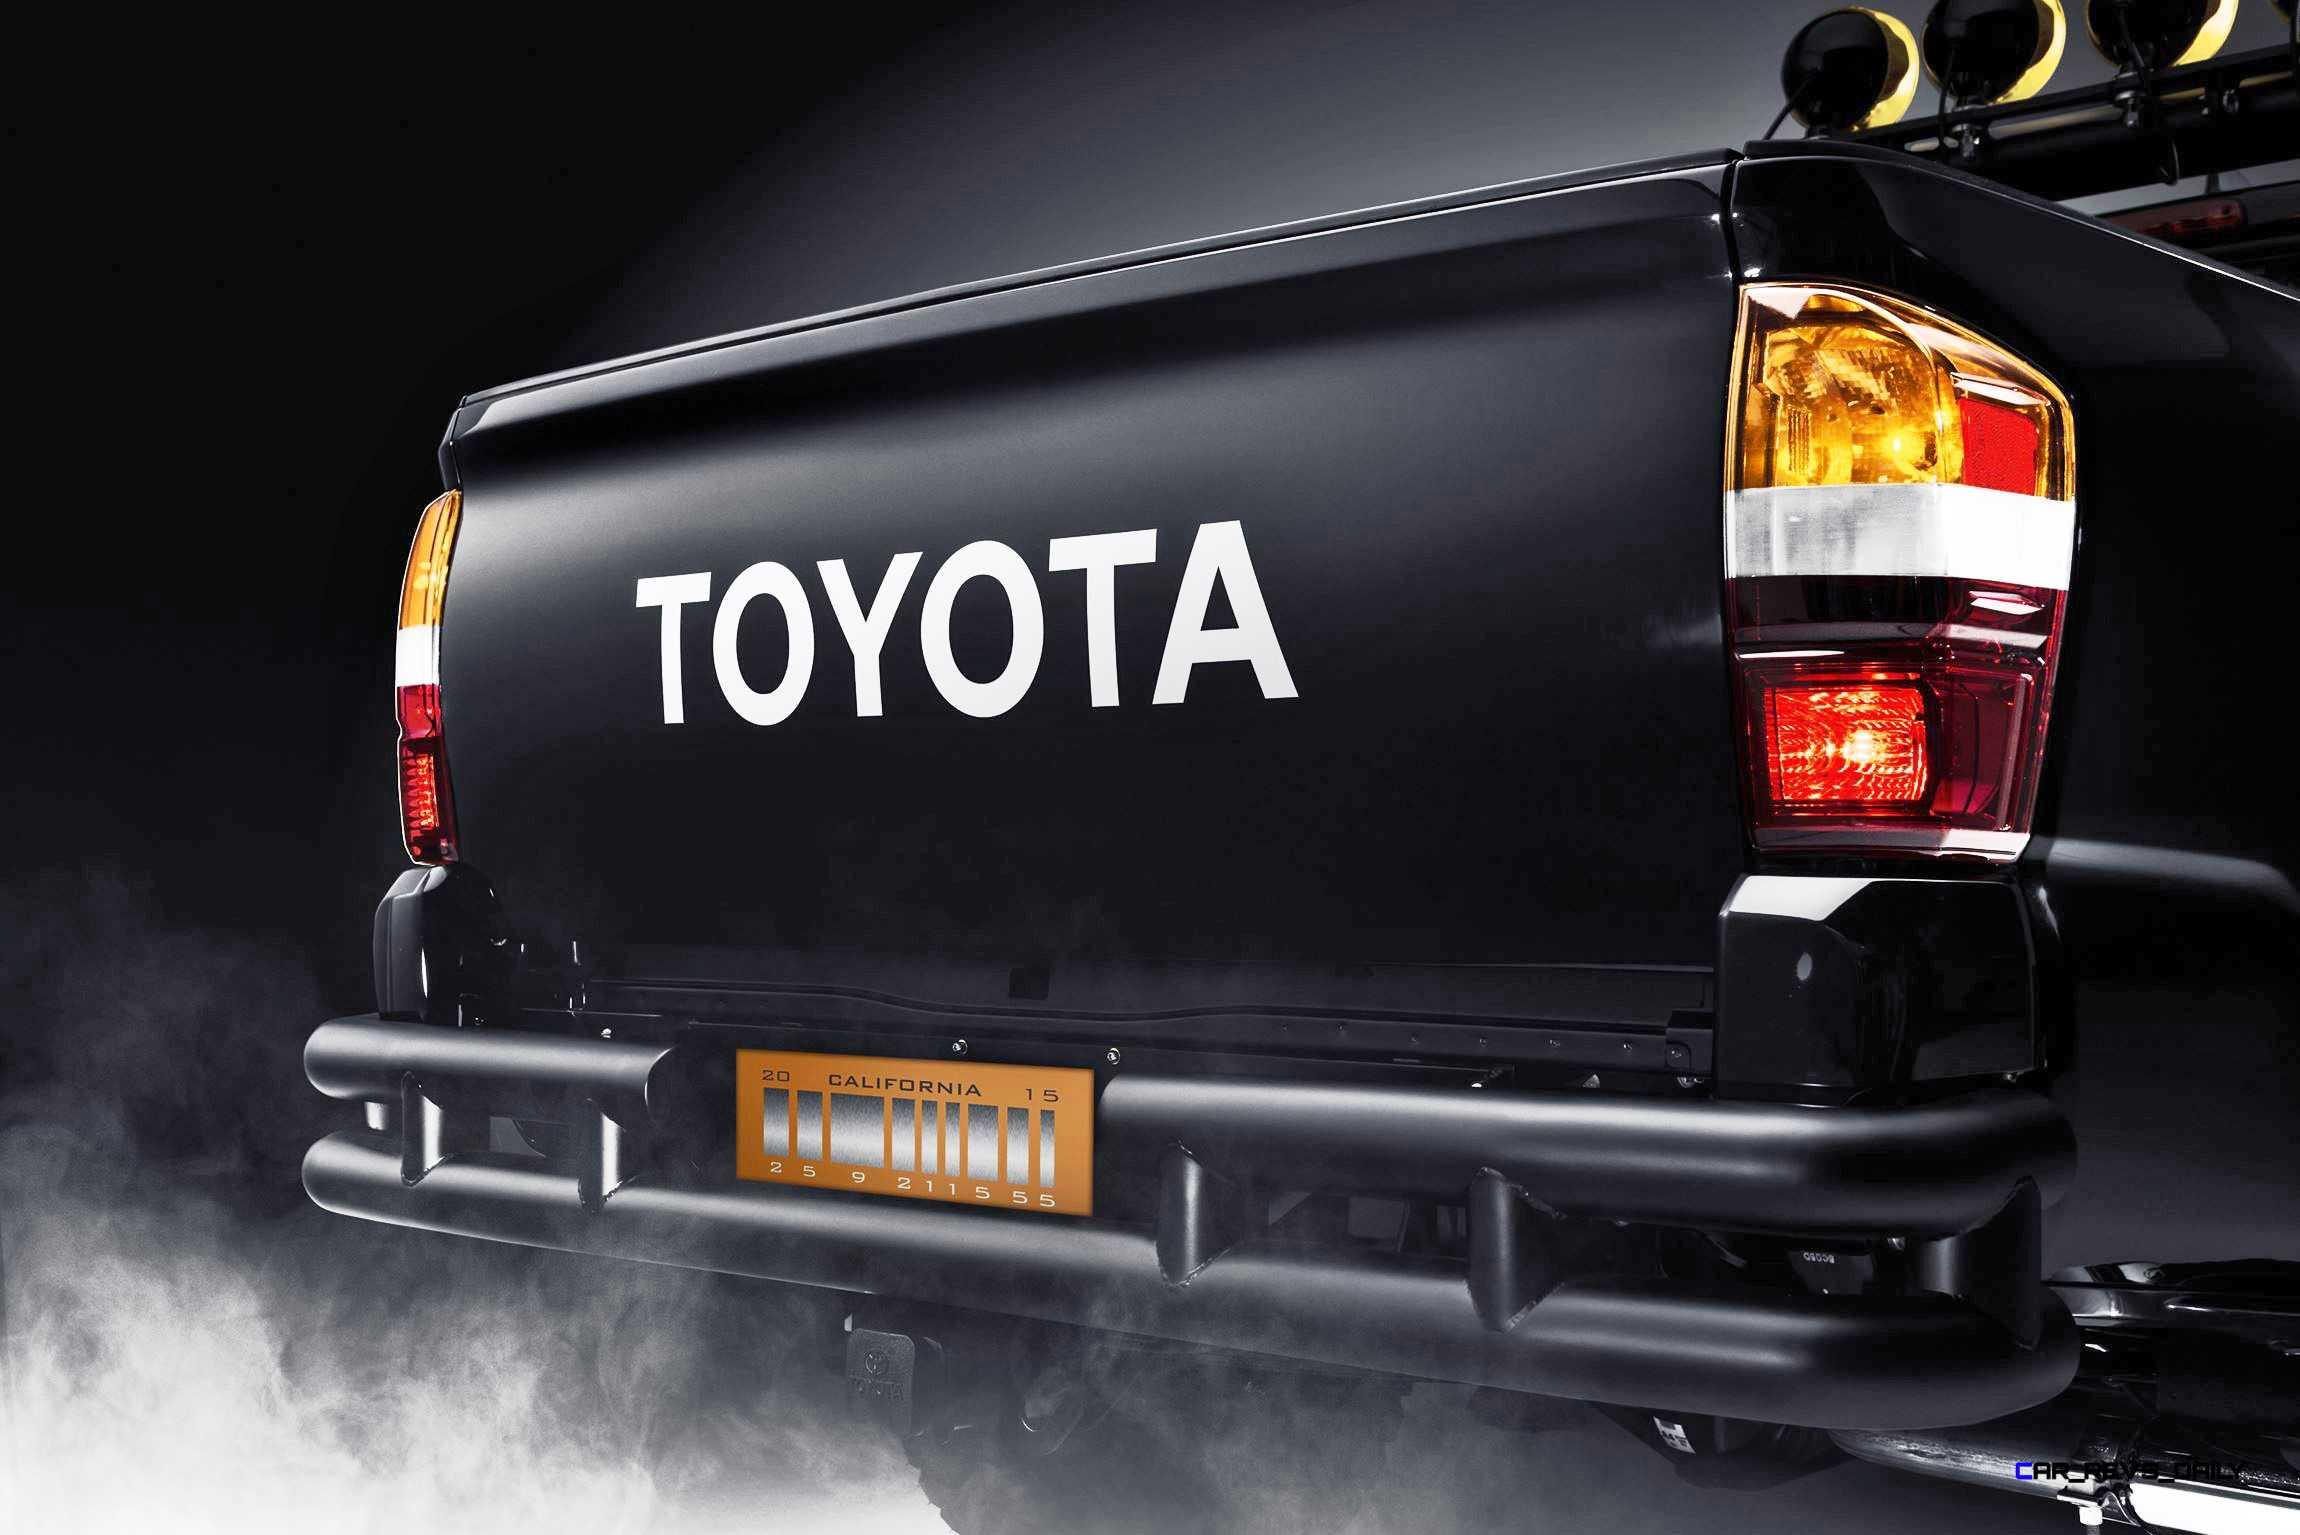 2016 Toyota TA A McFly BTTF